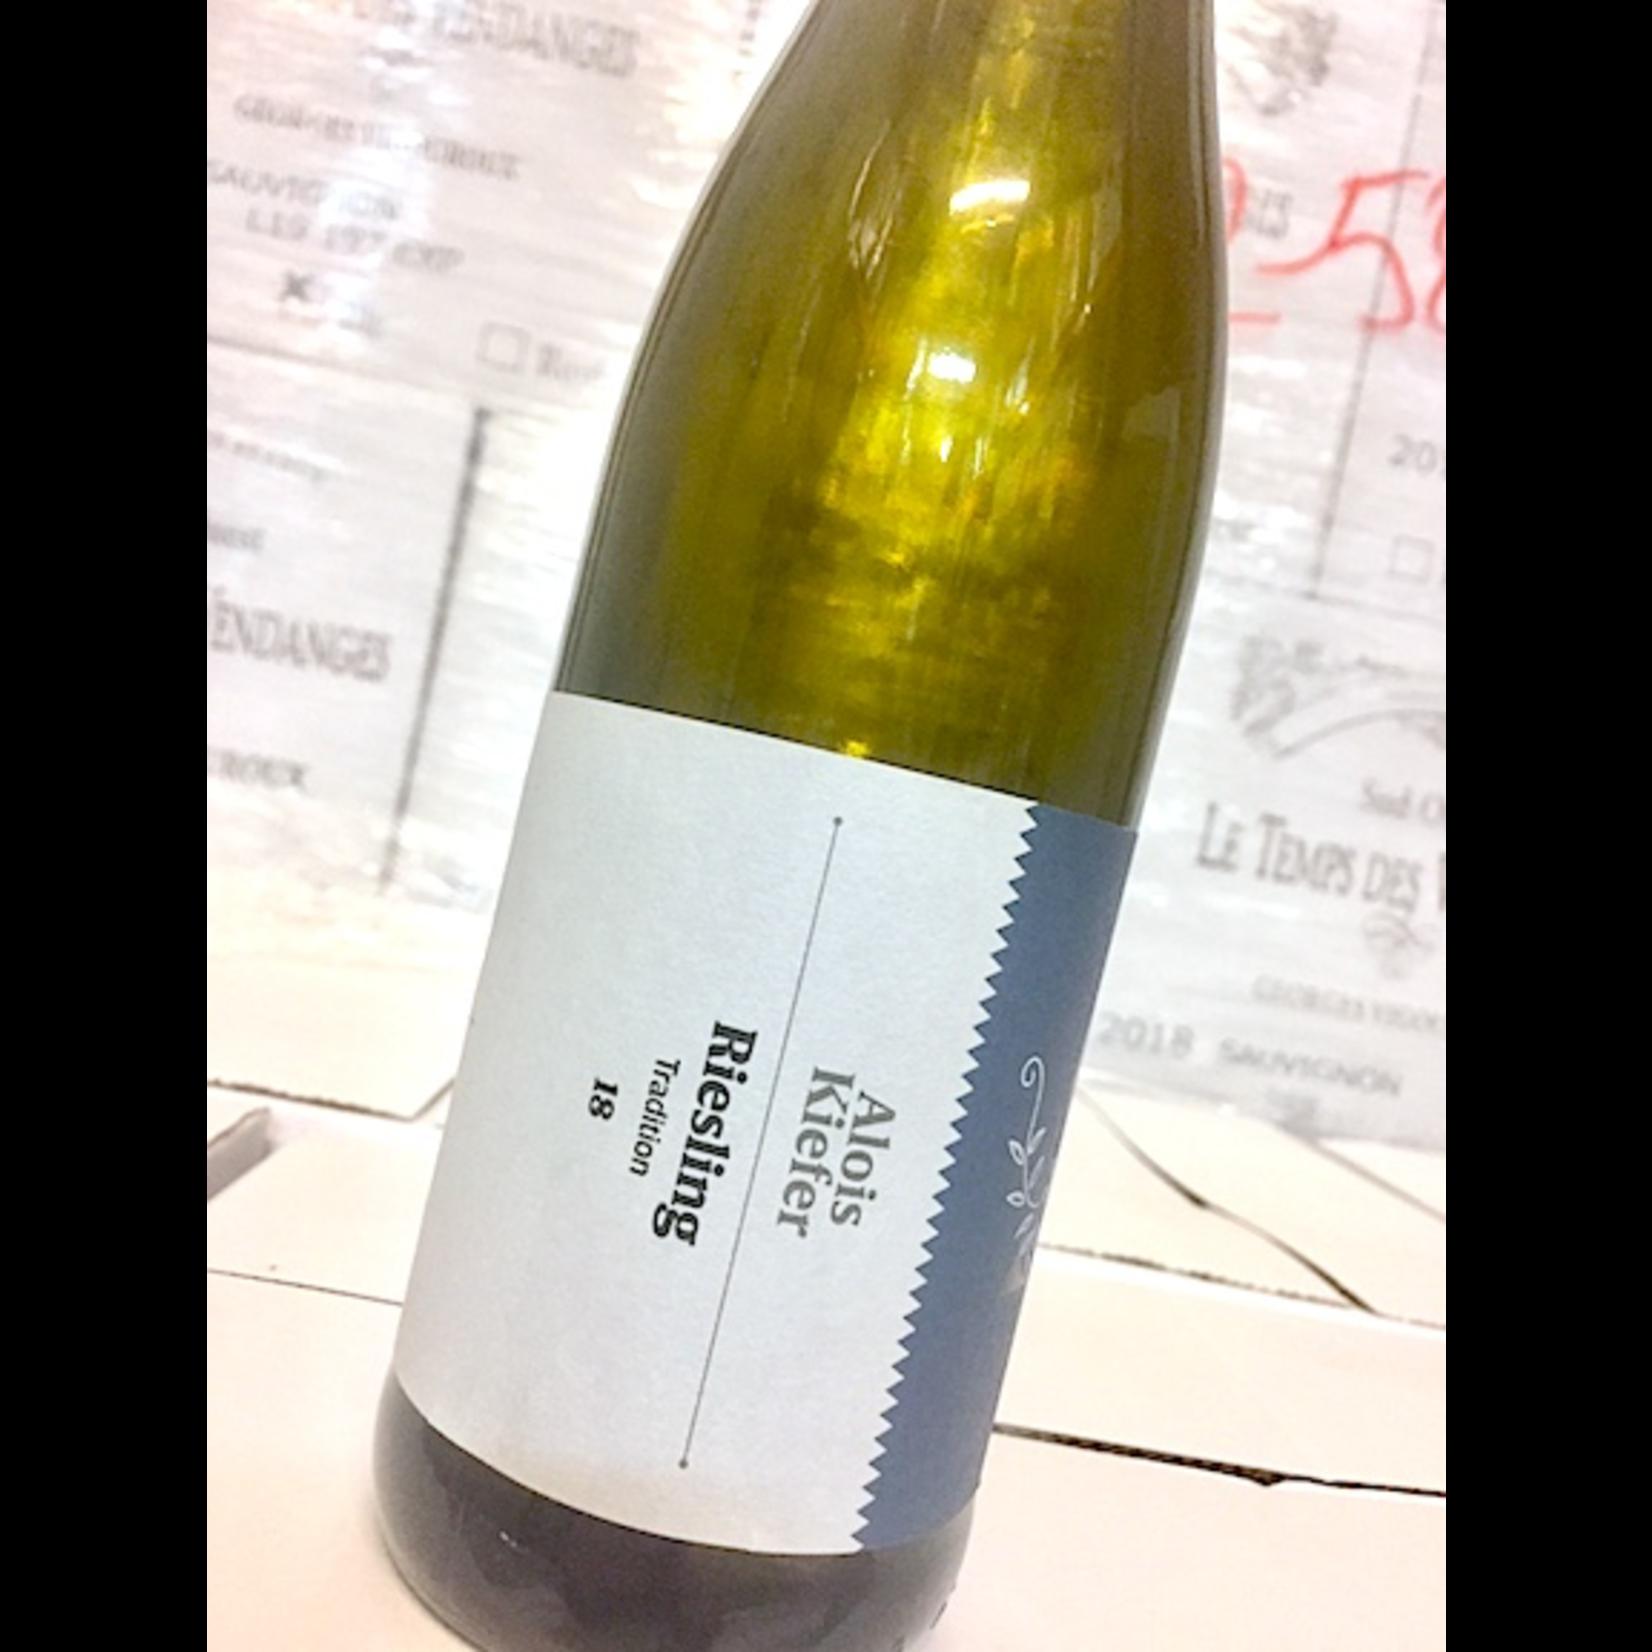 Wine Alois Kiefer Aloisiushof Riesling Tradition 2018